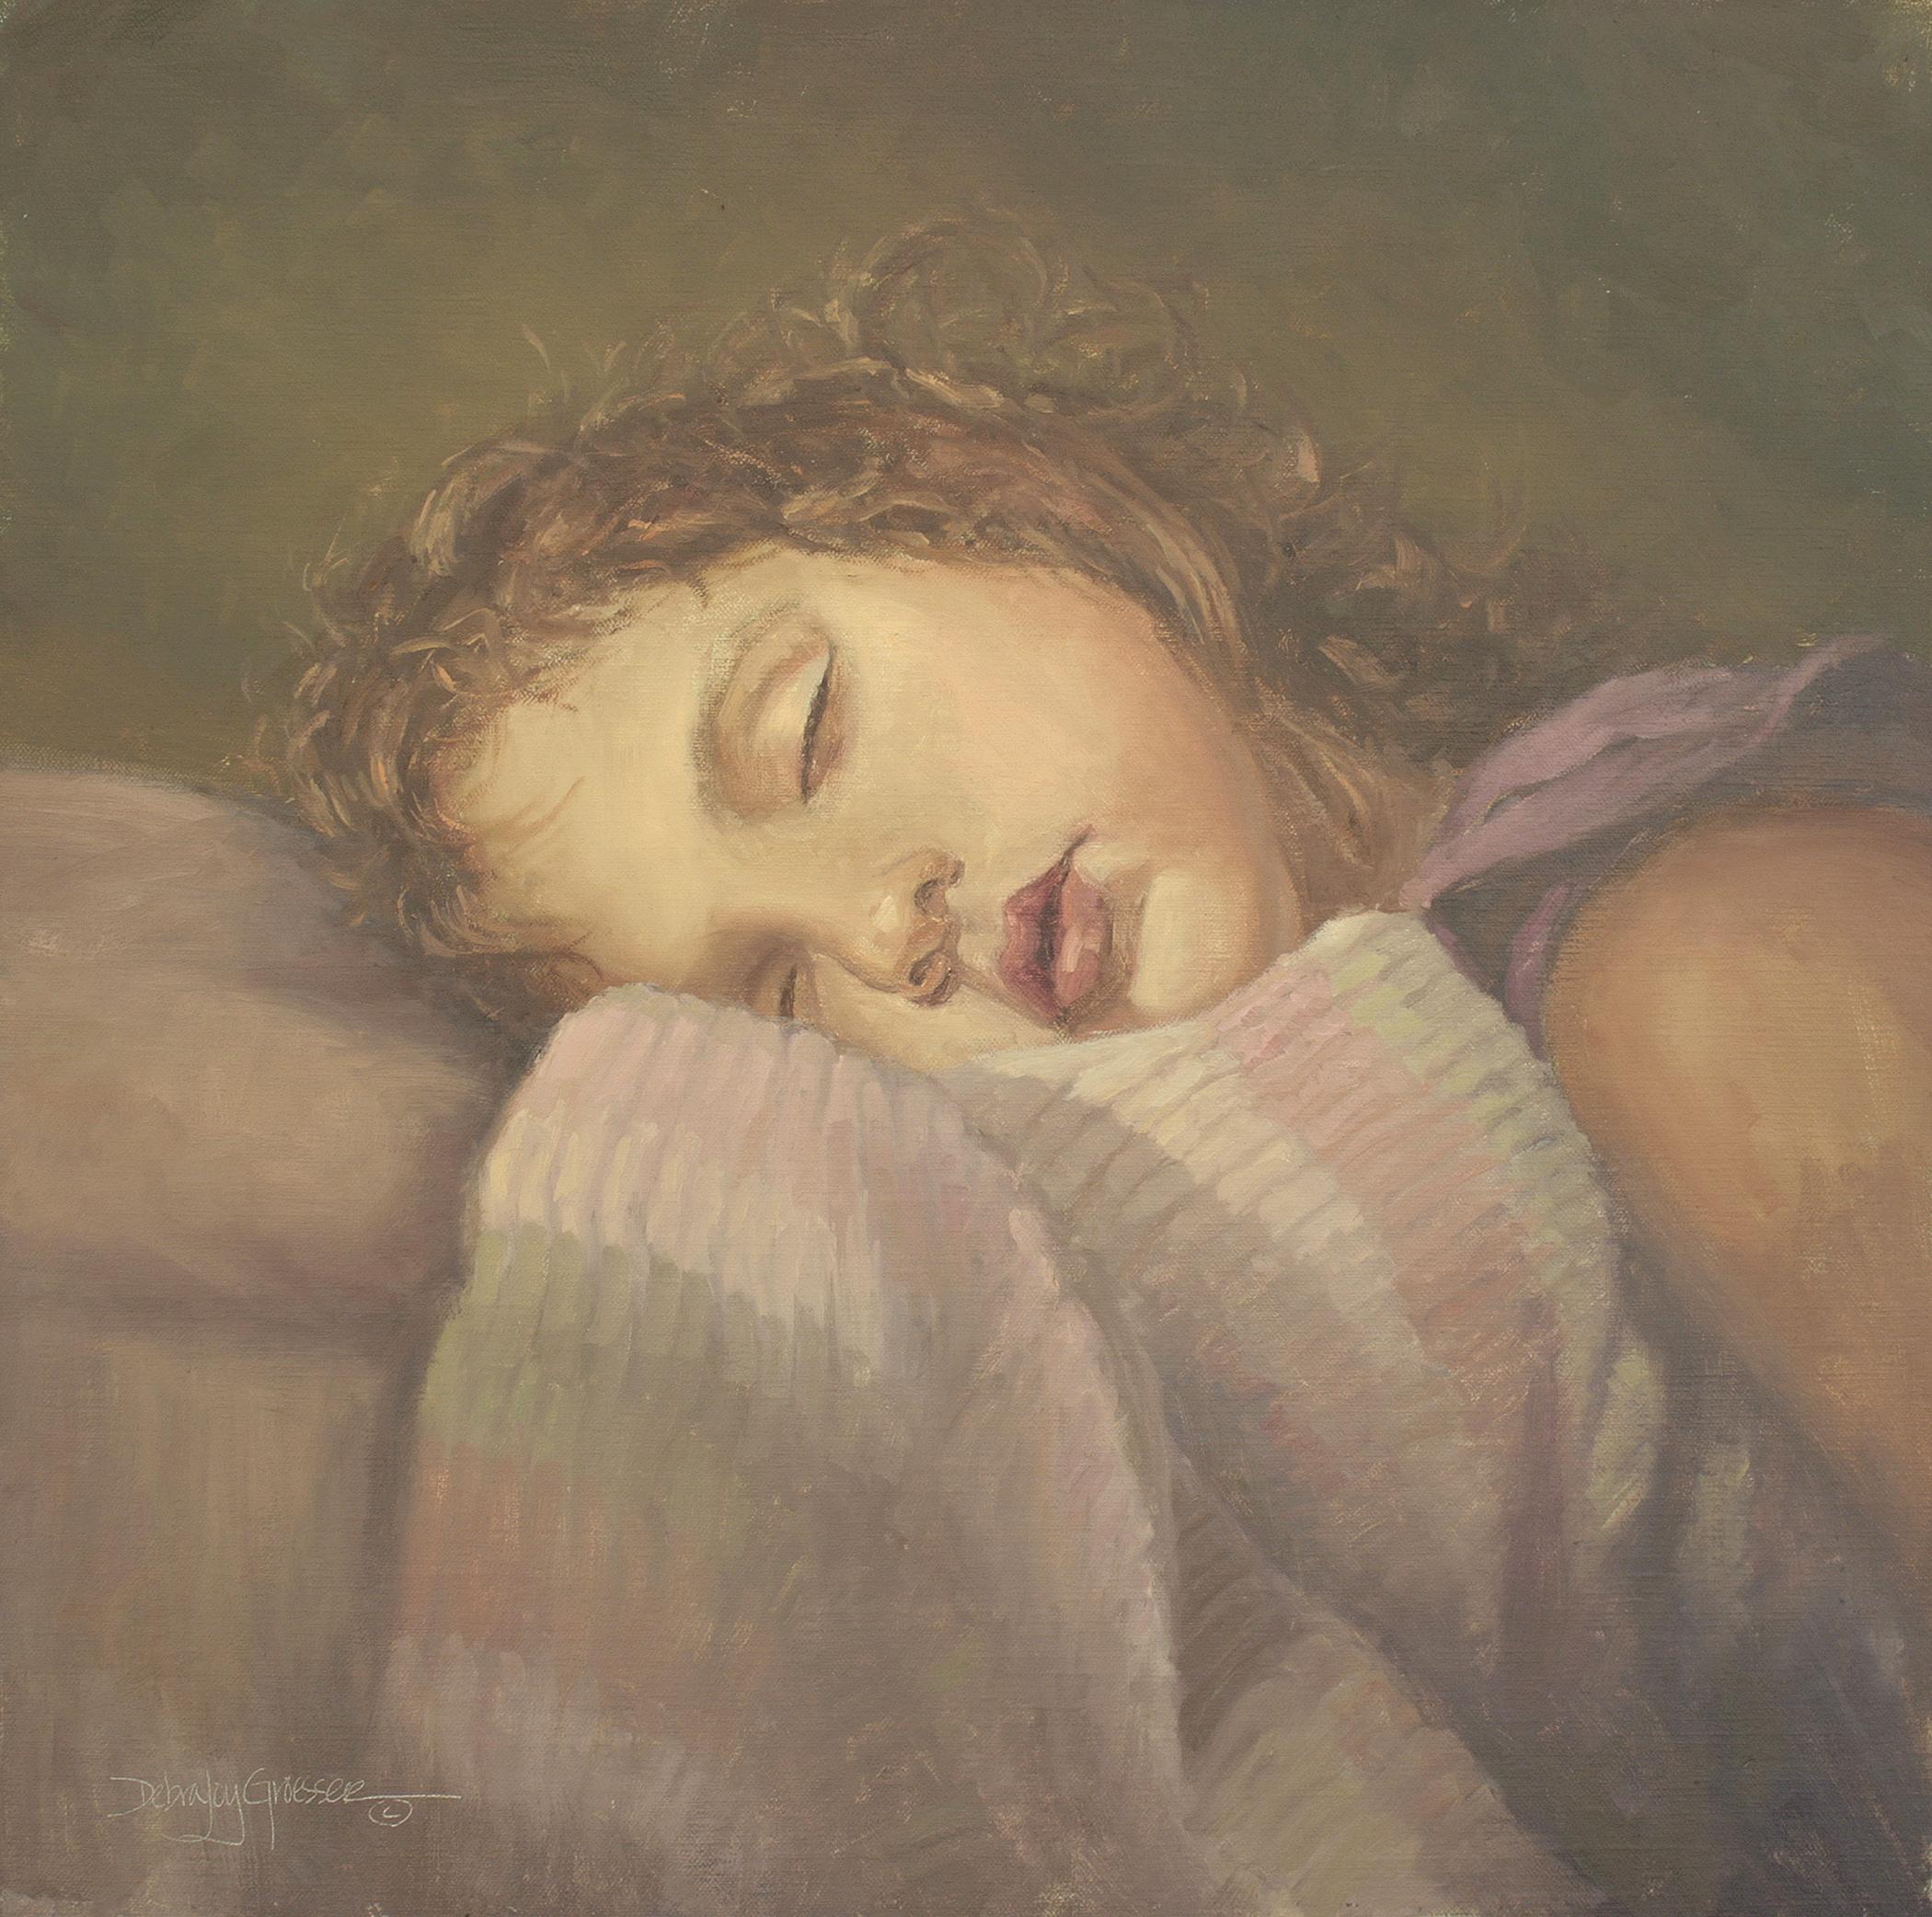 Debra Joy Groesser -  Dreams of a Princess,  2012  Ralston, NE